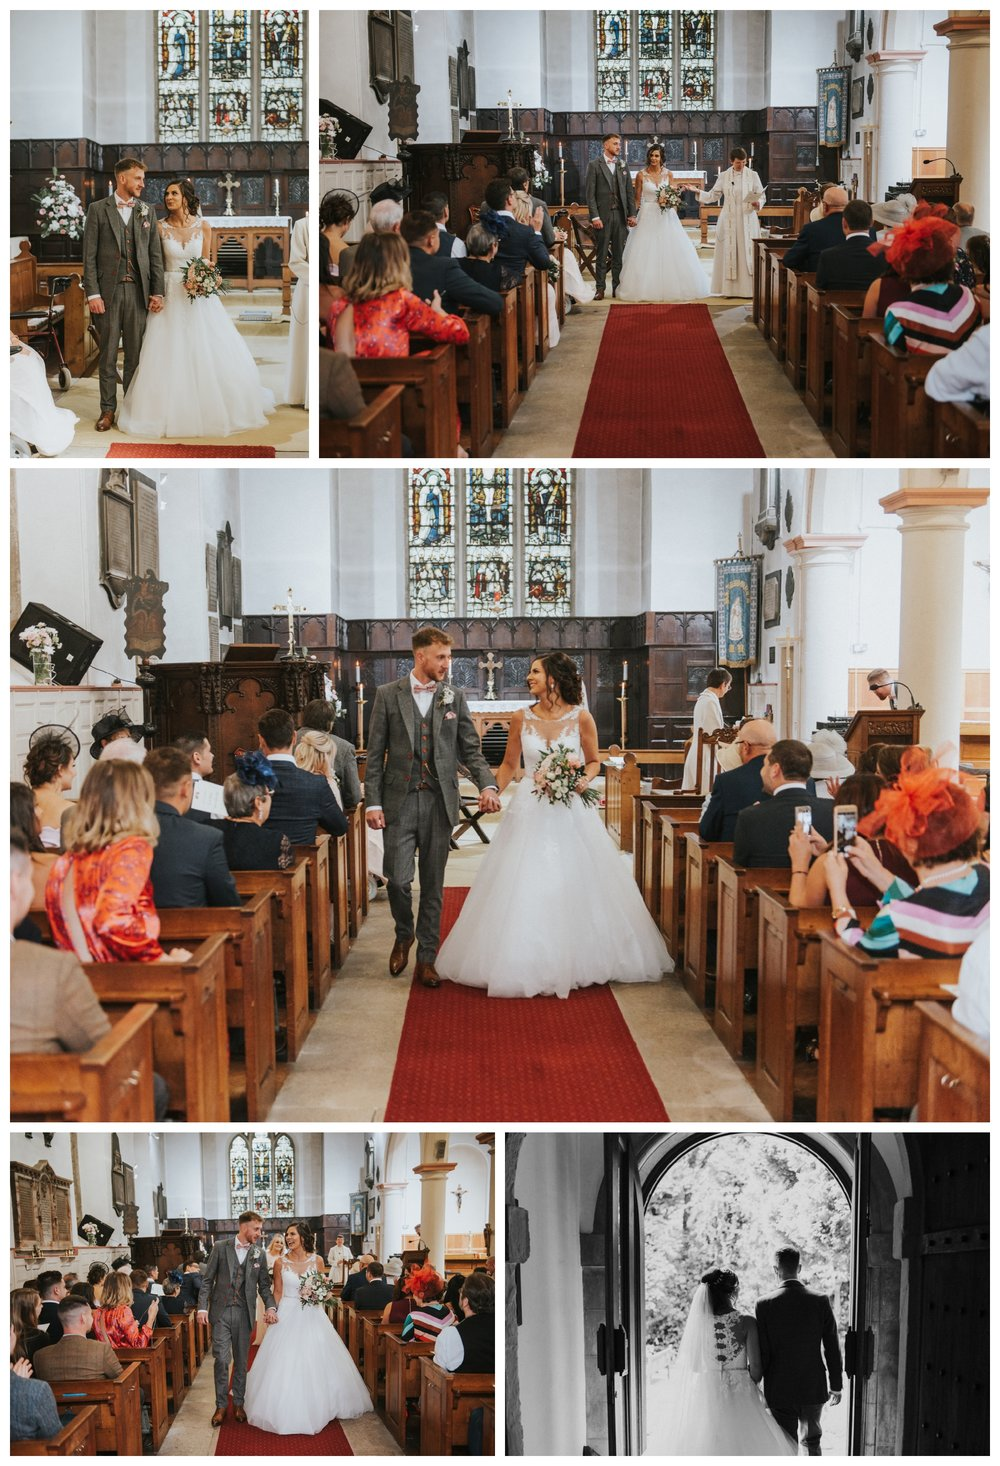 InkersgallGrangeFarm-LukeHolroyd-Yorkshirewedding_0052.jpg